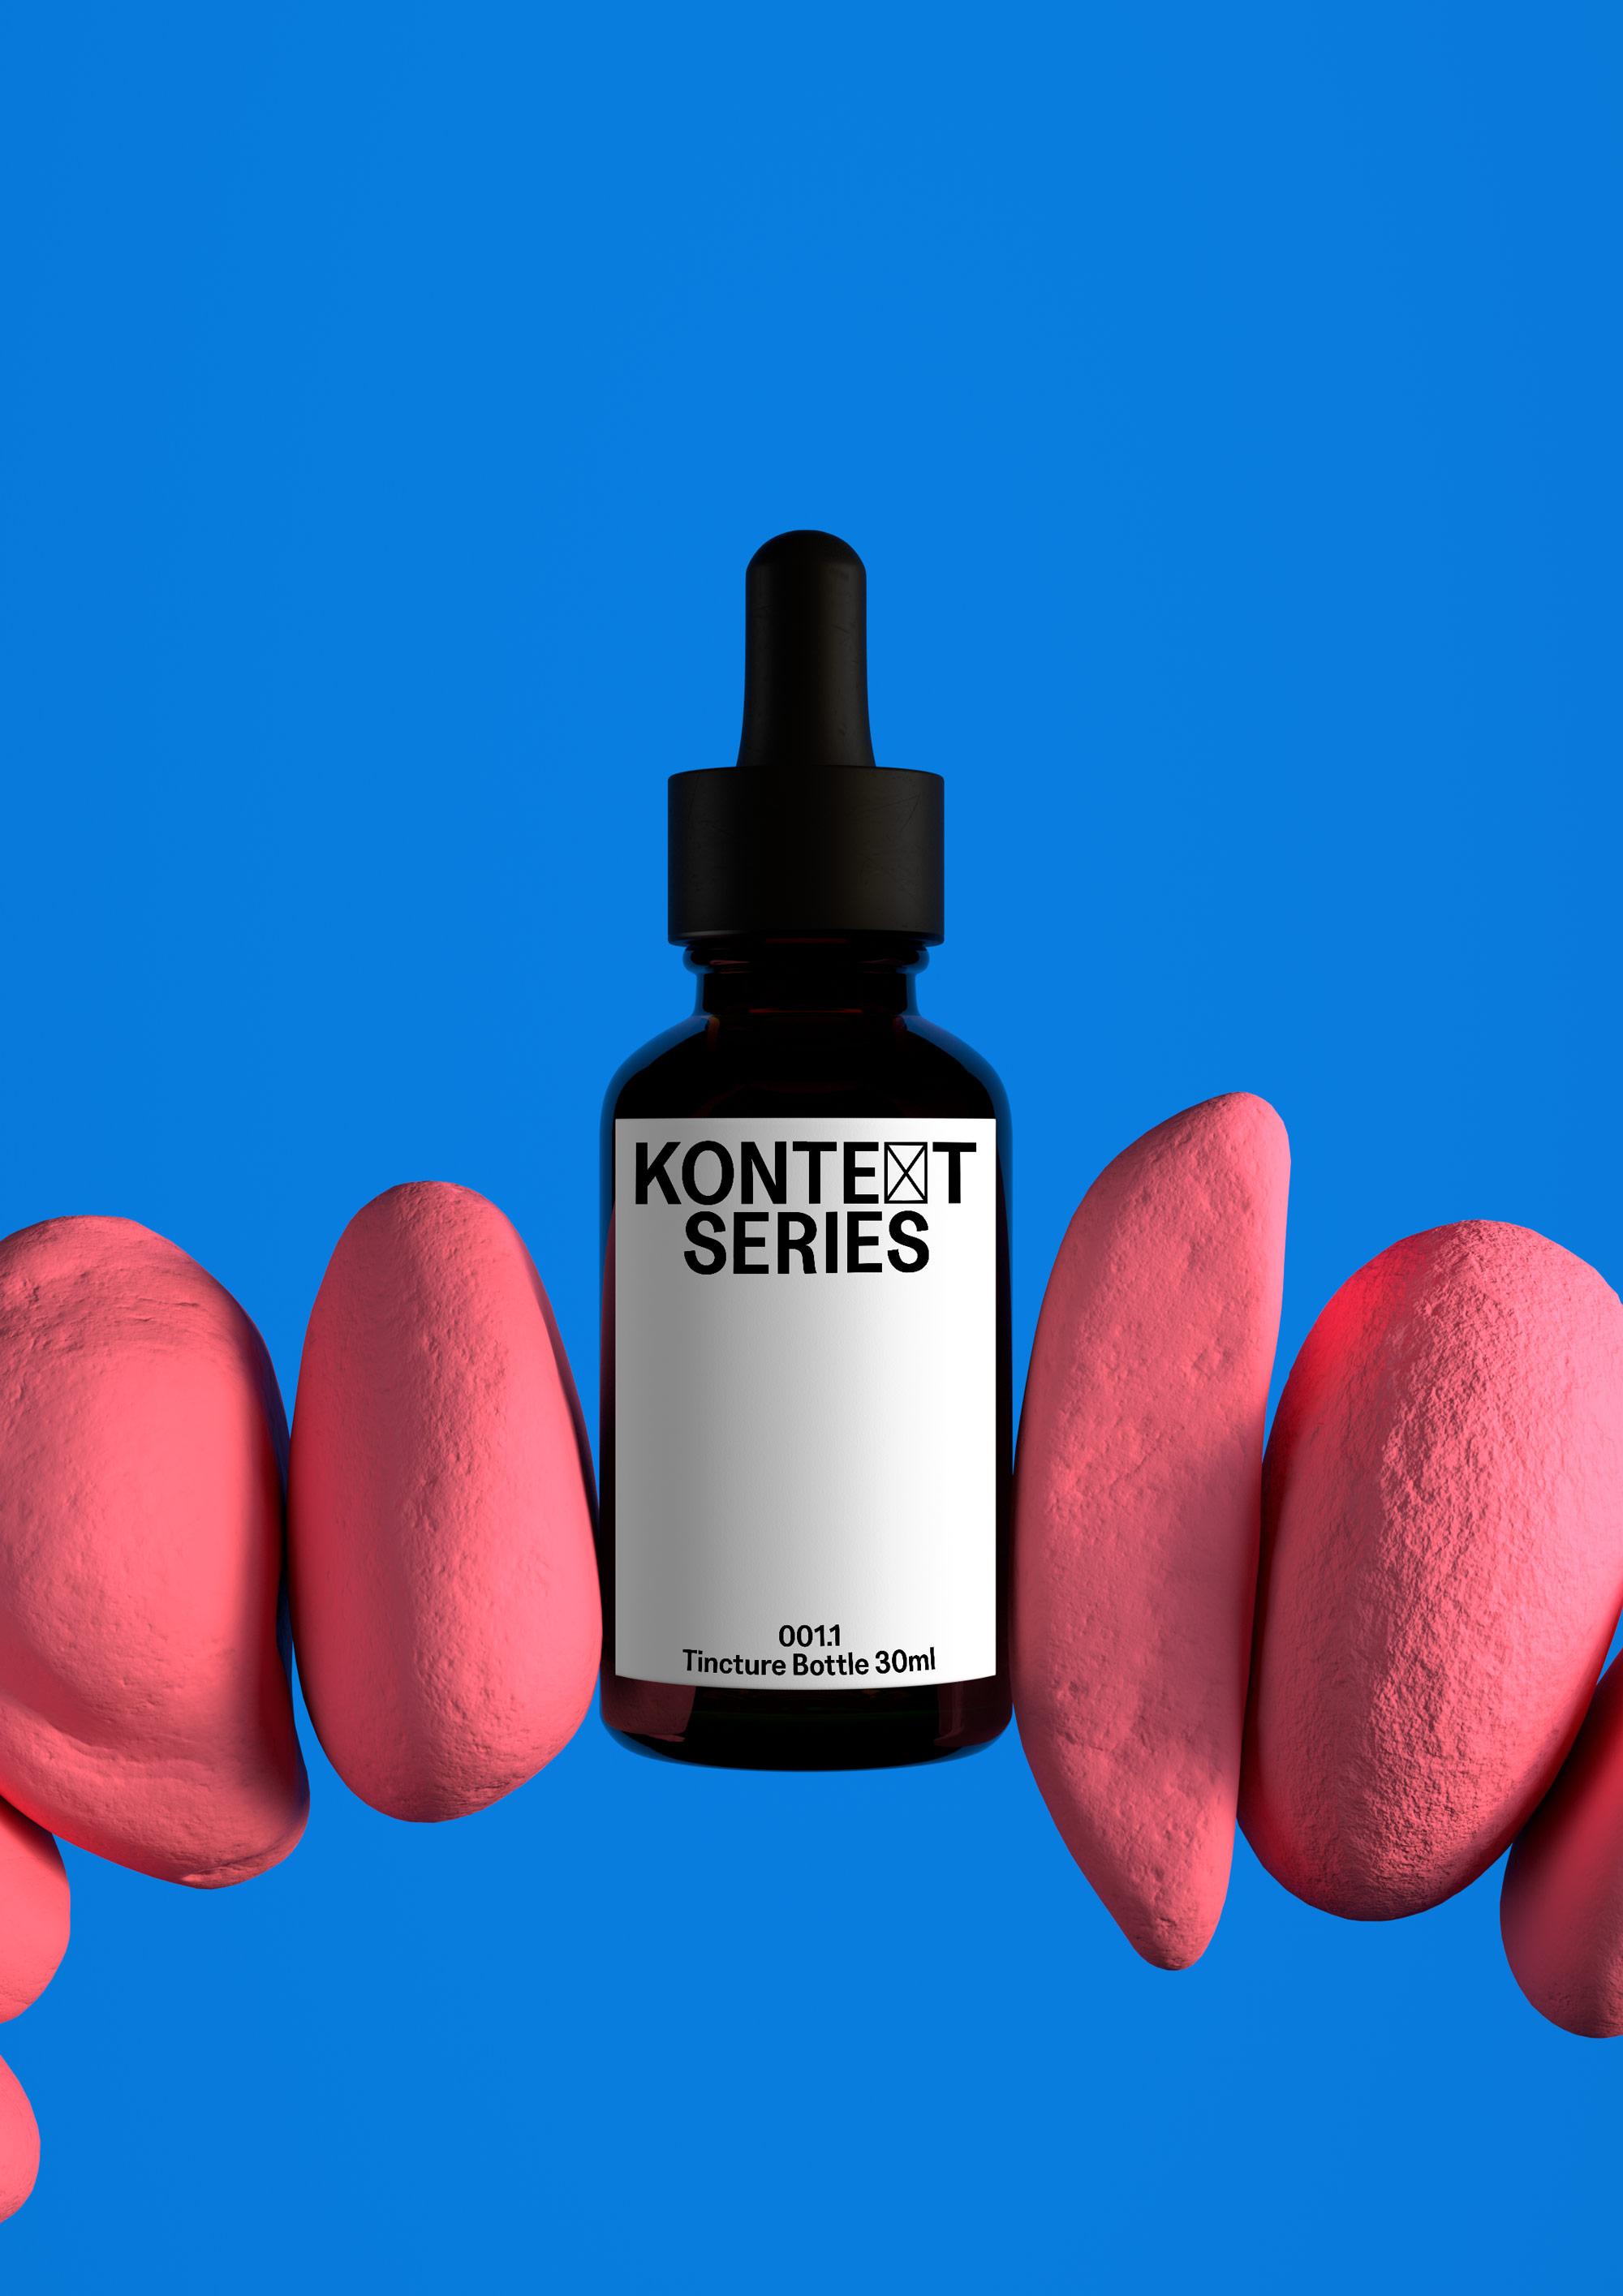 Kontext - Cosmetics Mockup